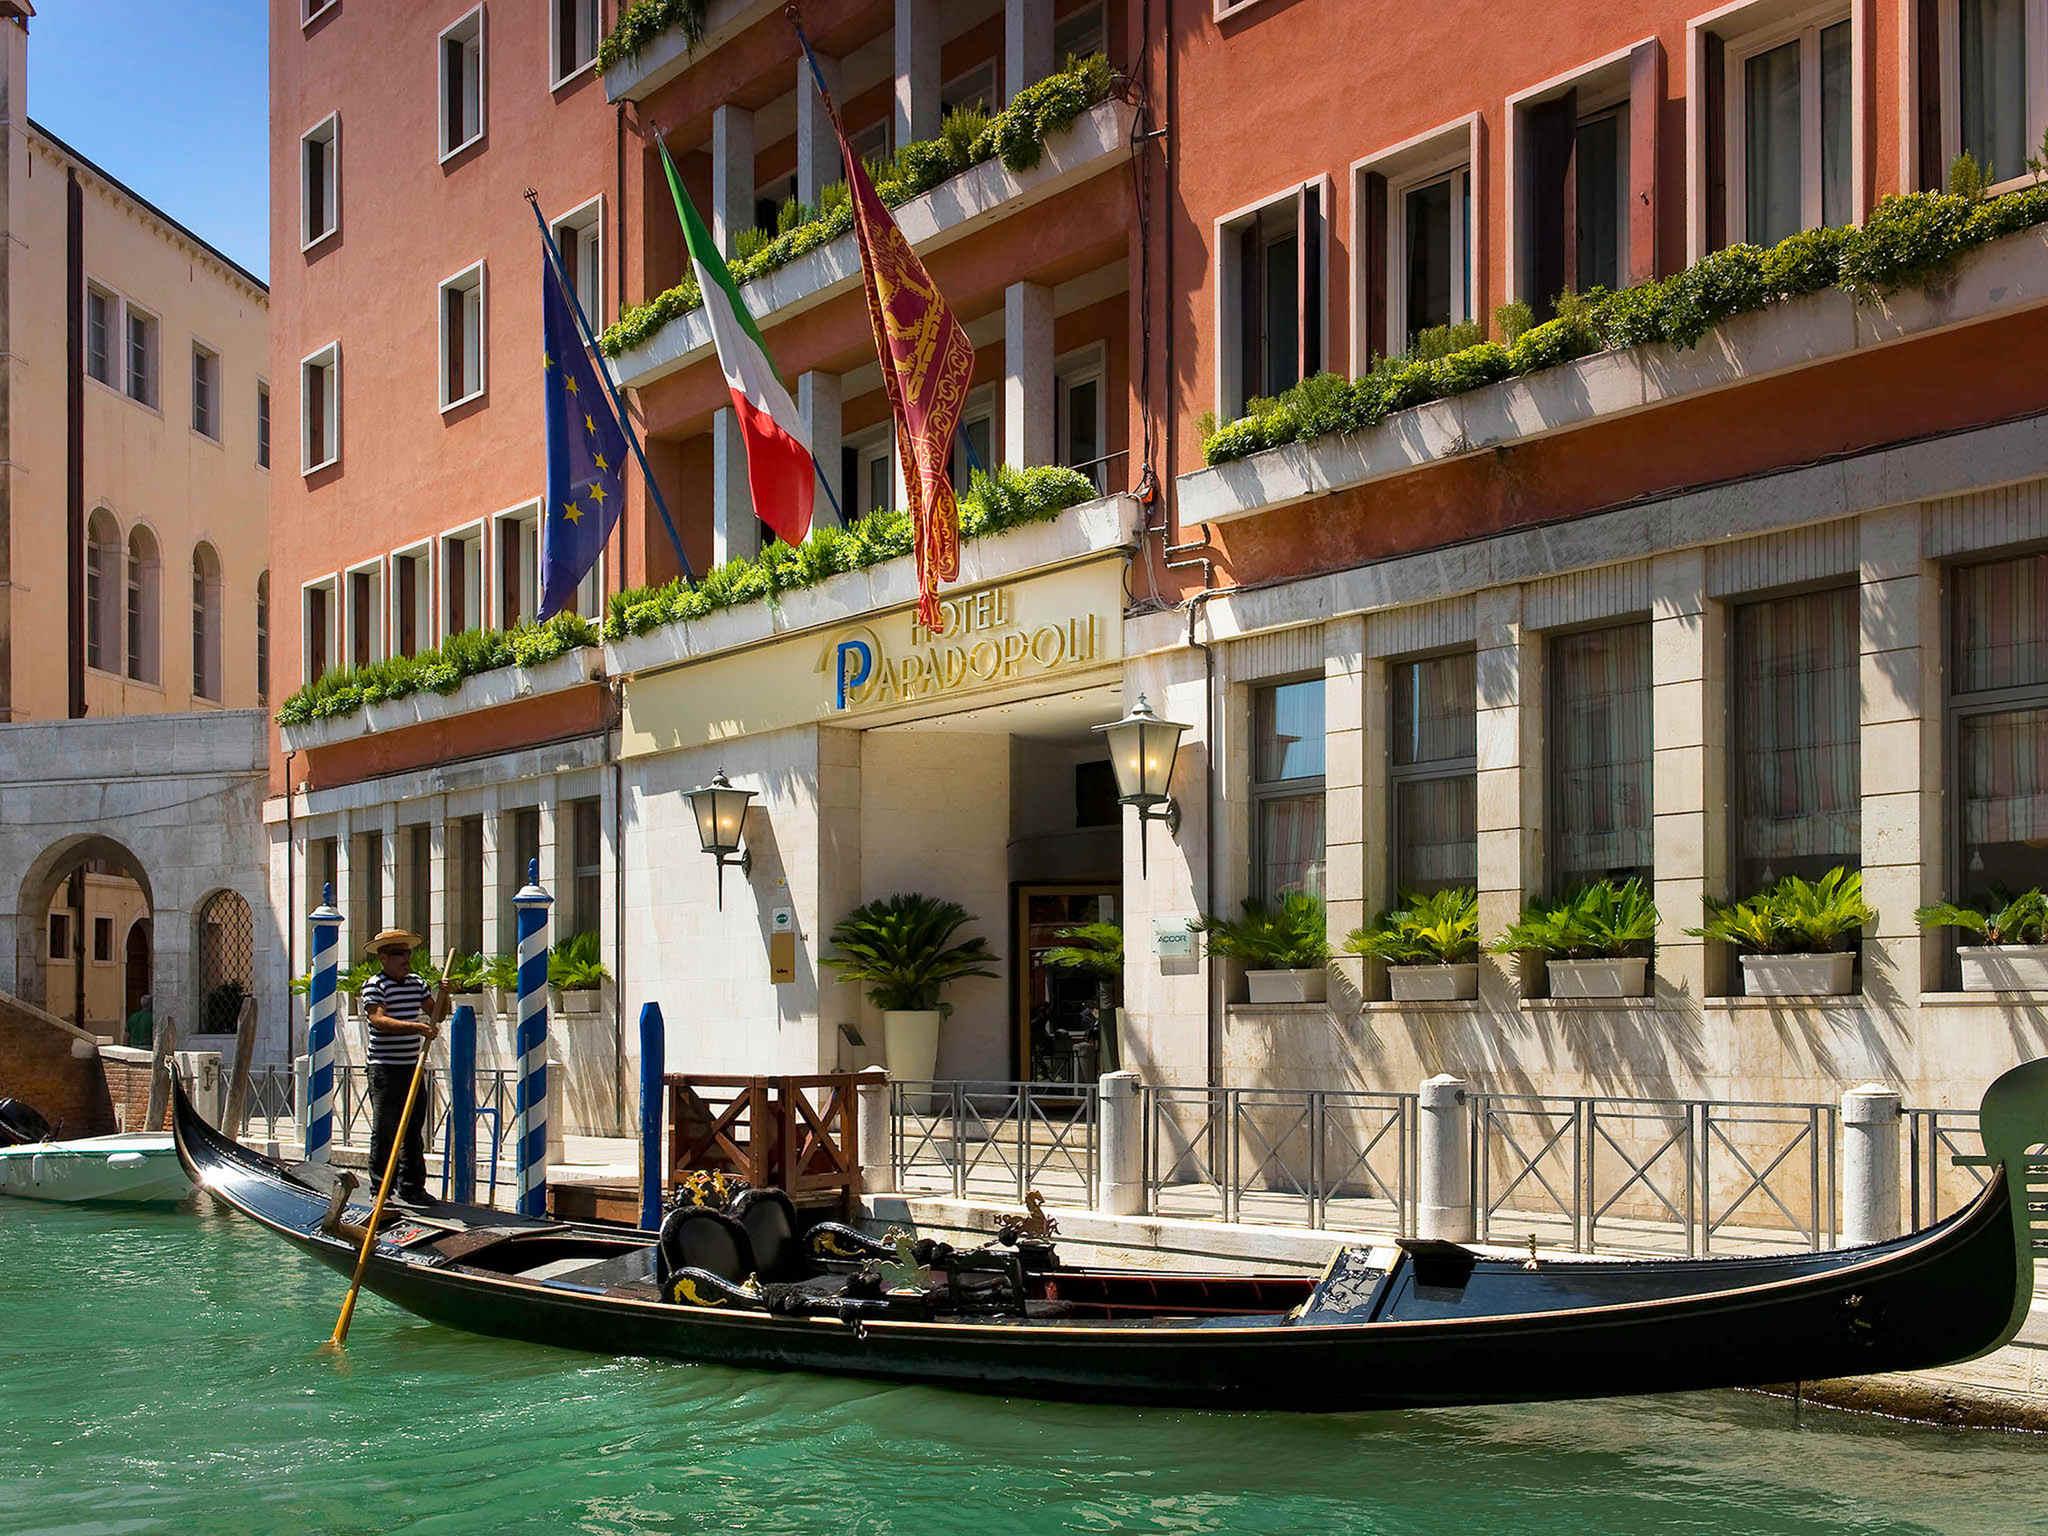 Hotel Papadopoli Venezia Mgallery By Sofitel Accorhotels